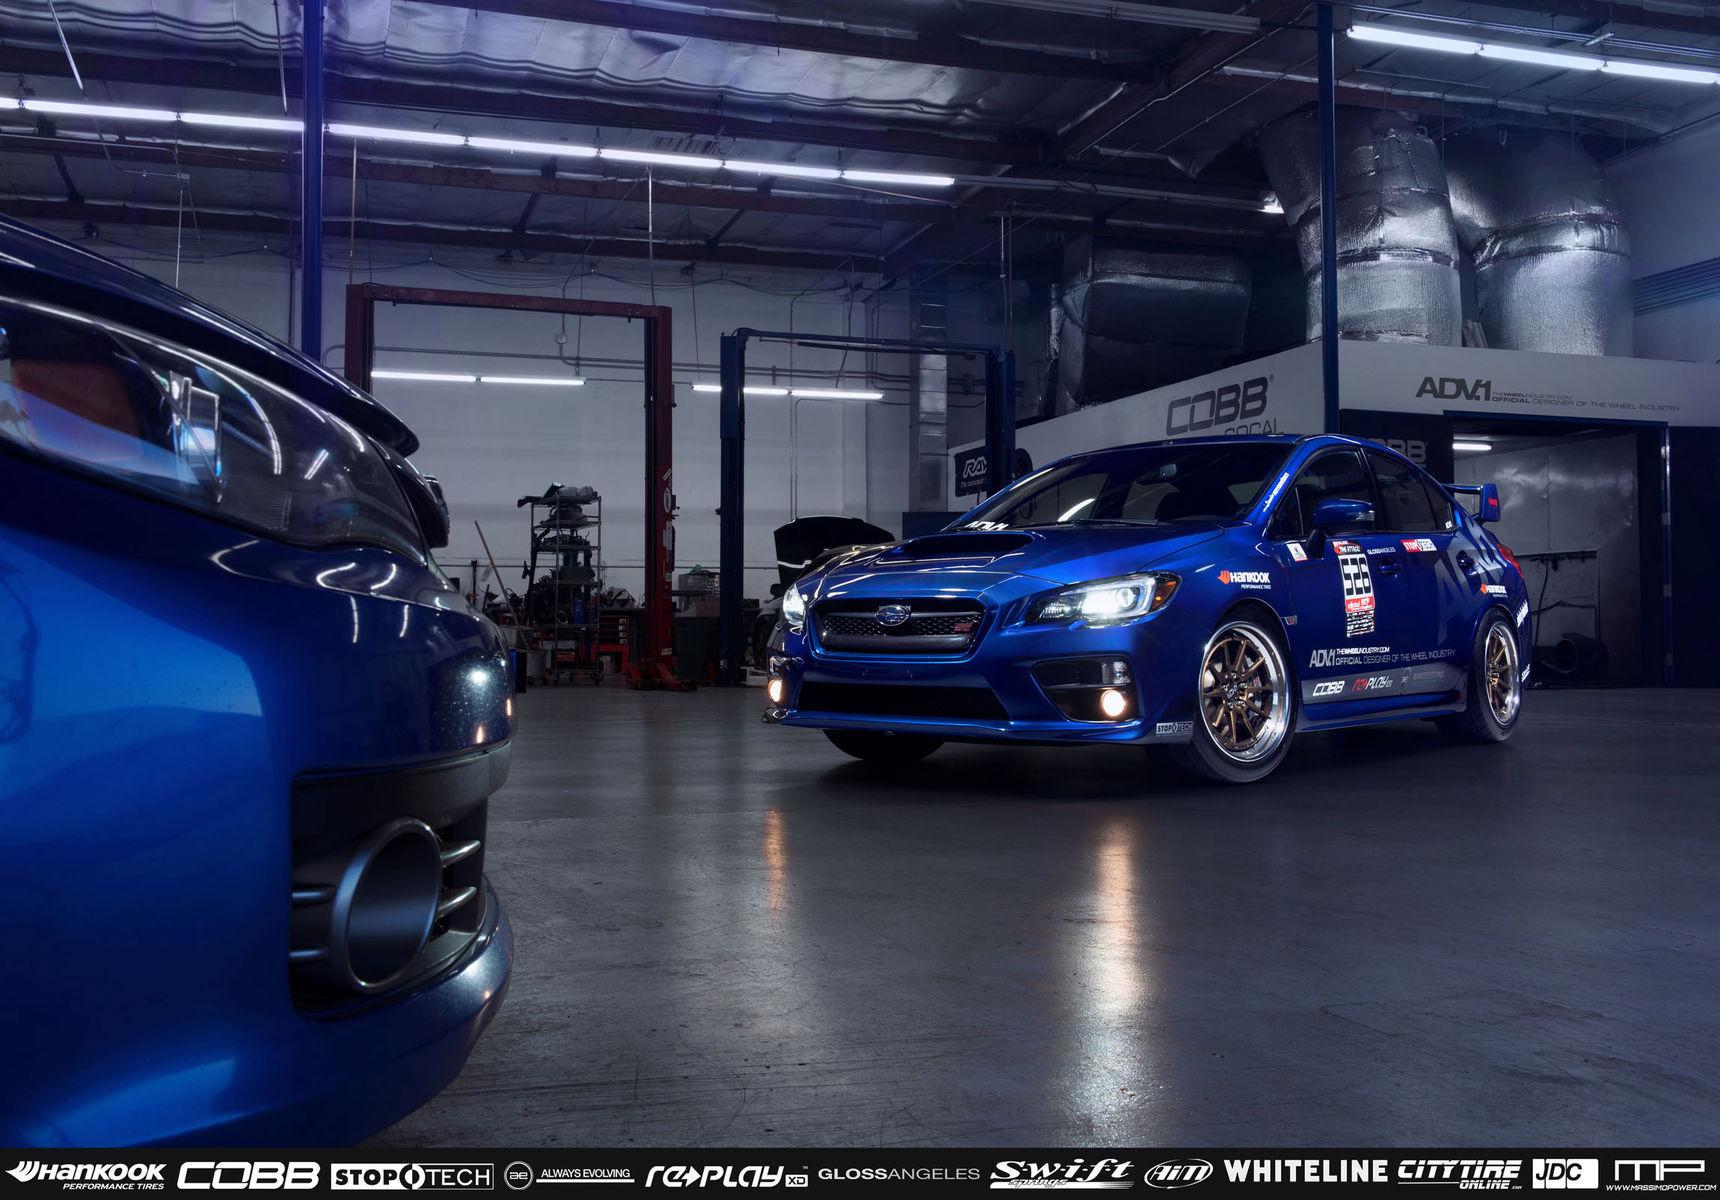 2015 Subaru STI | ADV.1 STI Racecar